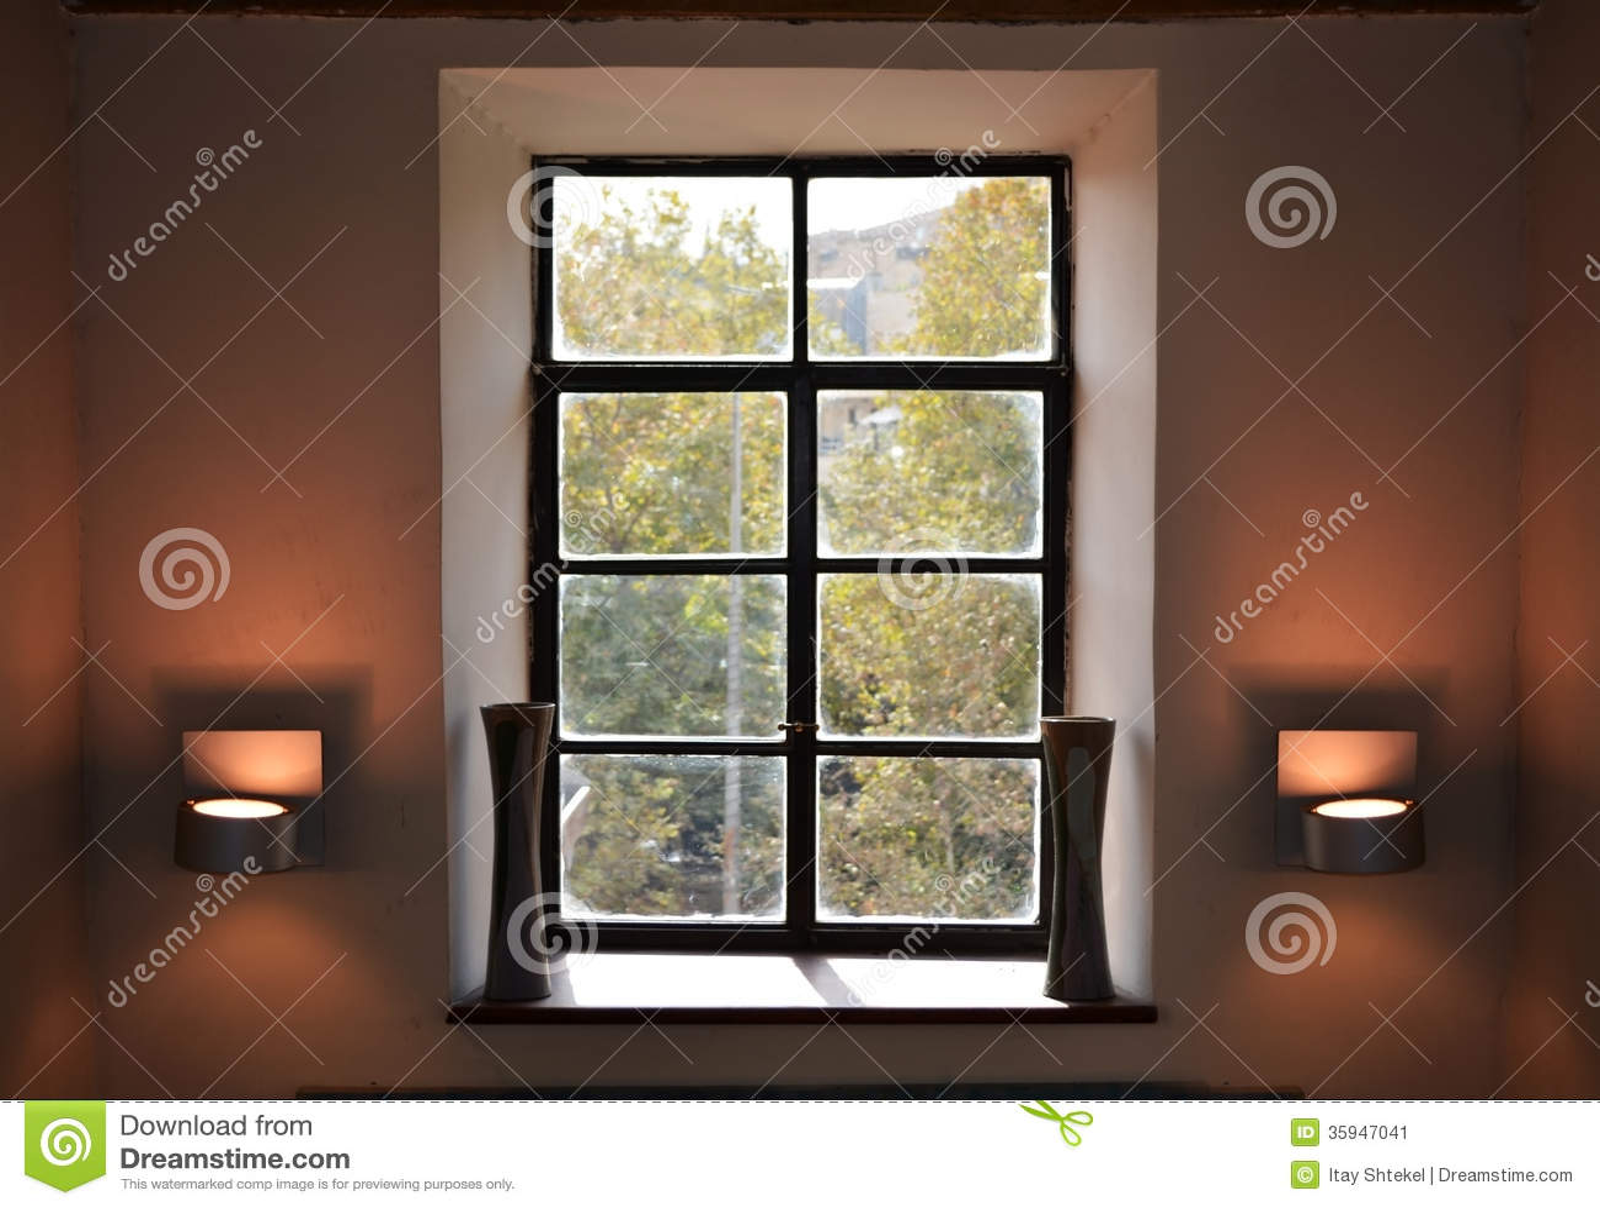 Vintage Window Interior Design Stock Image  Image of